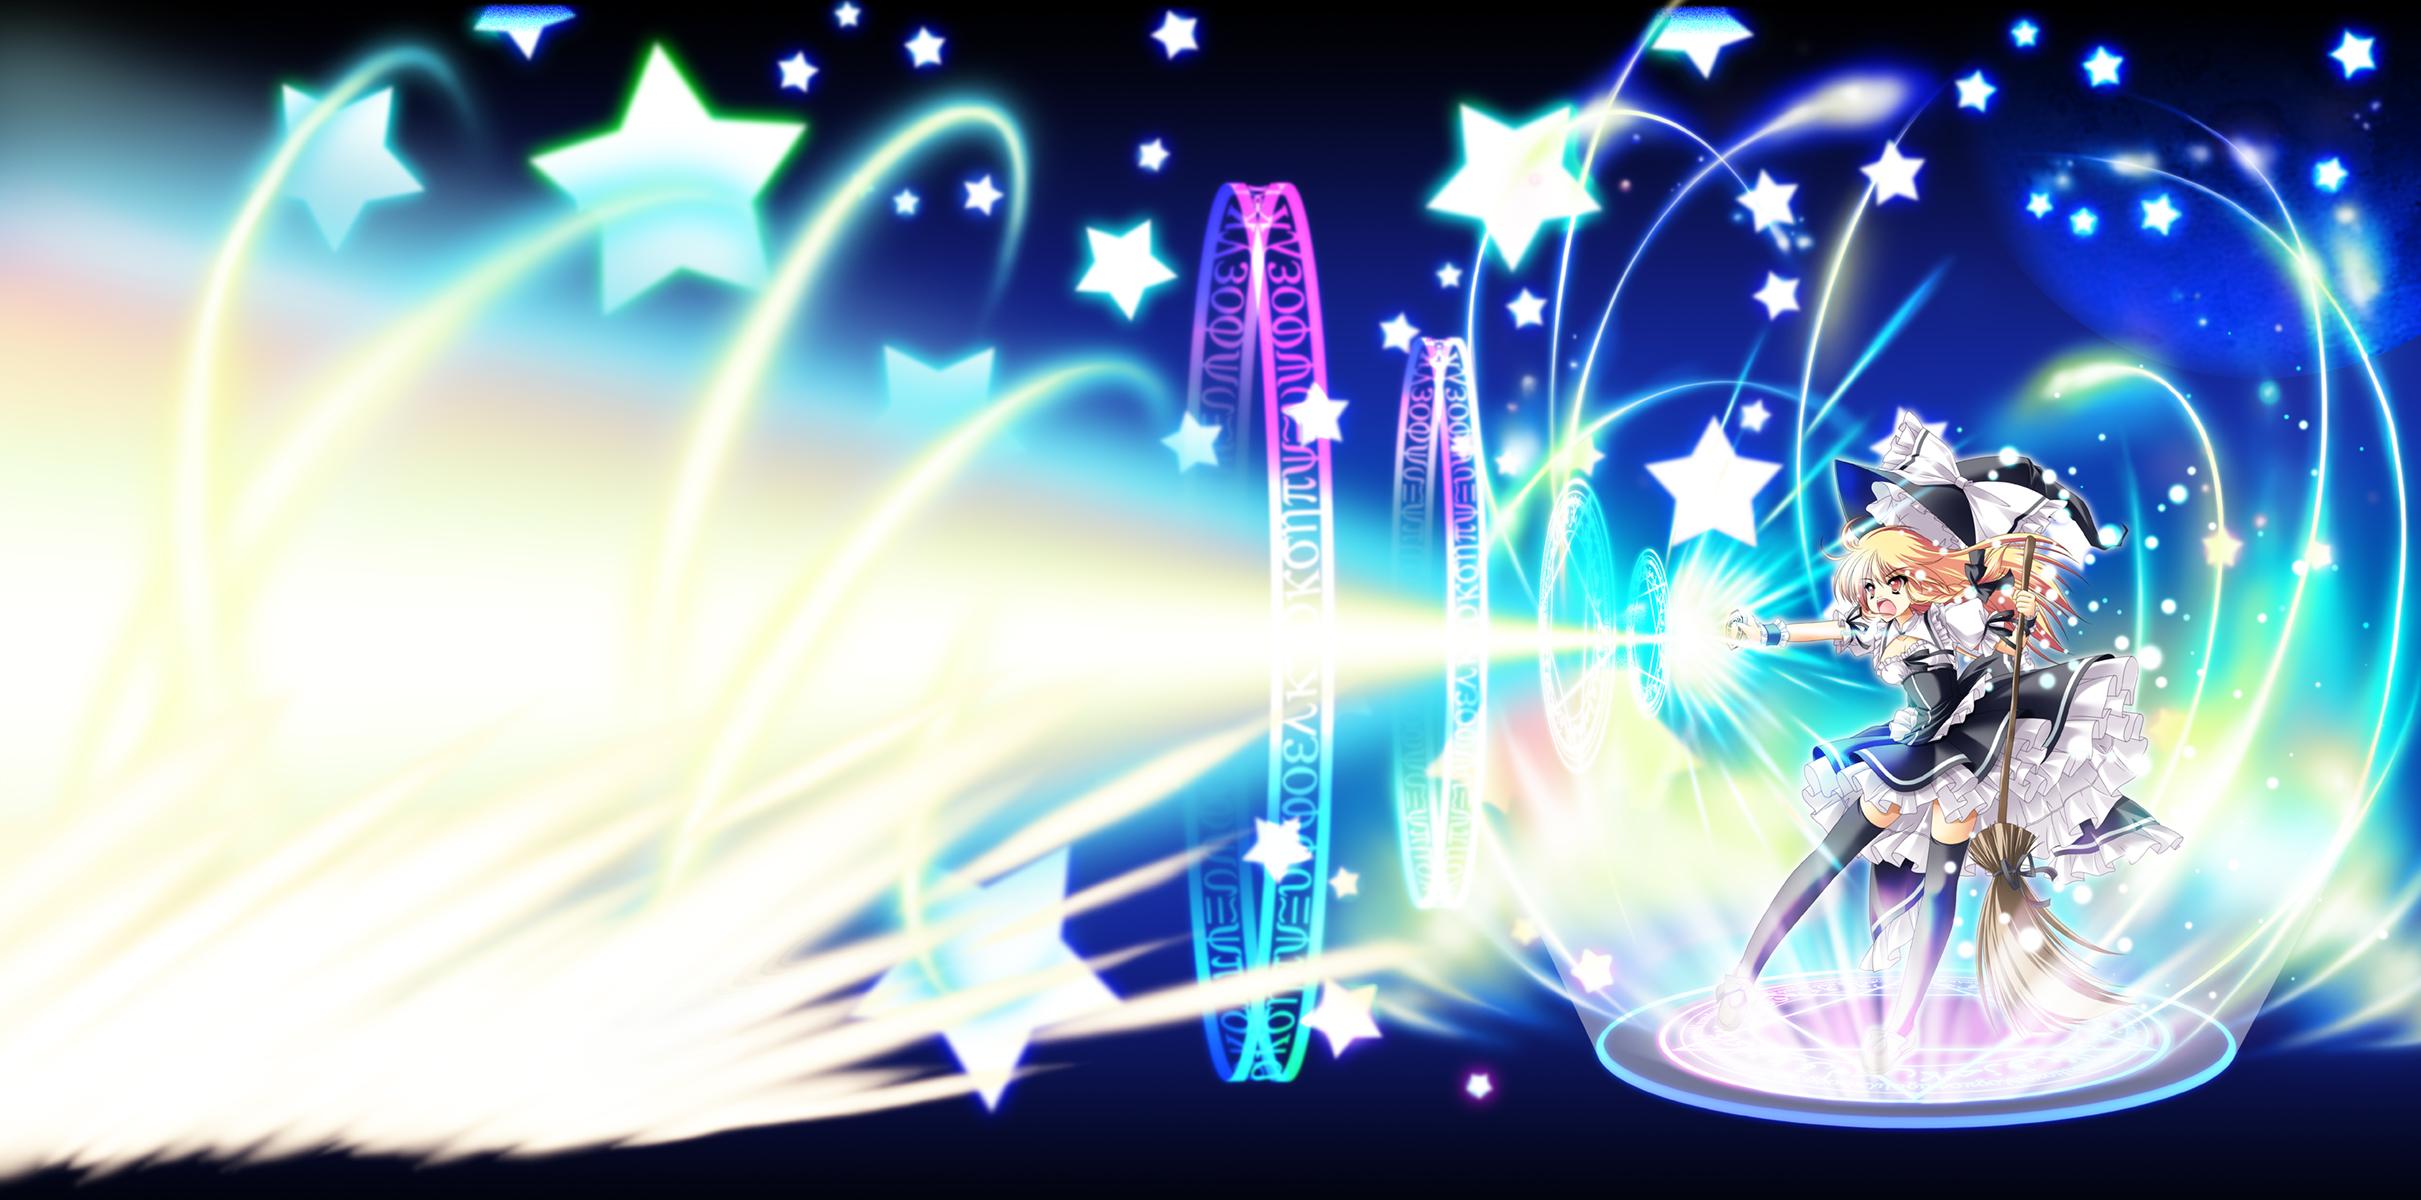 Master spark touhou zerochan anime image board - Download anime wallpaper pack ...